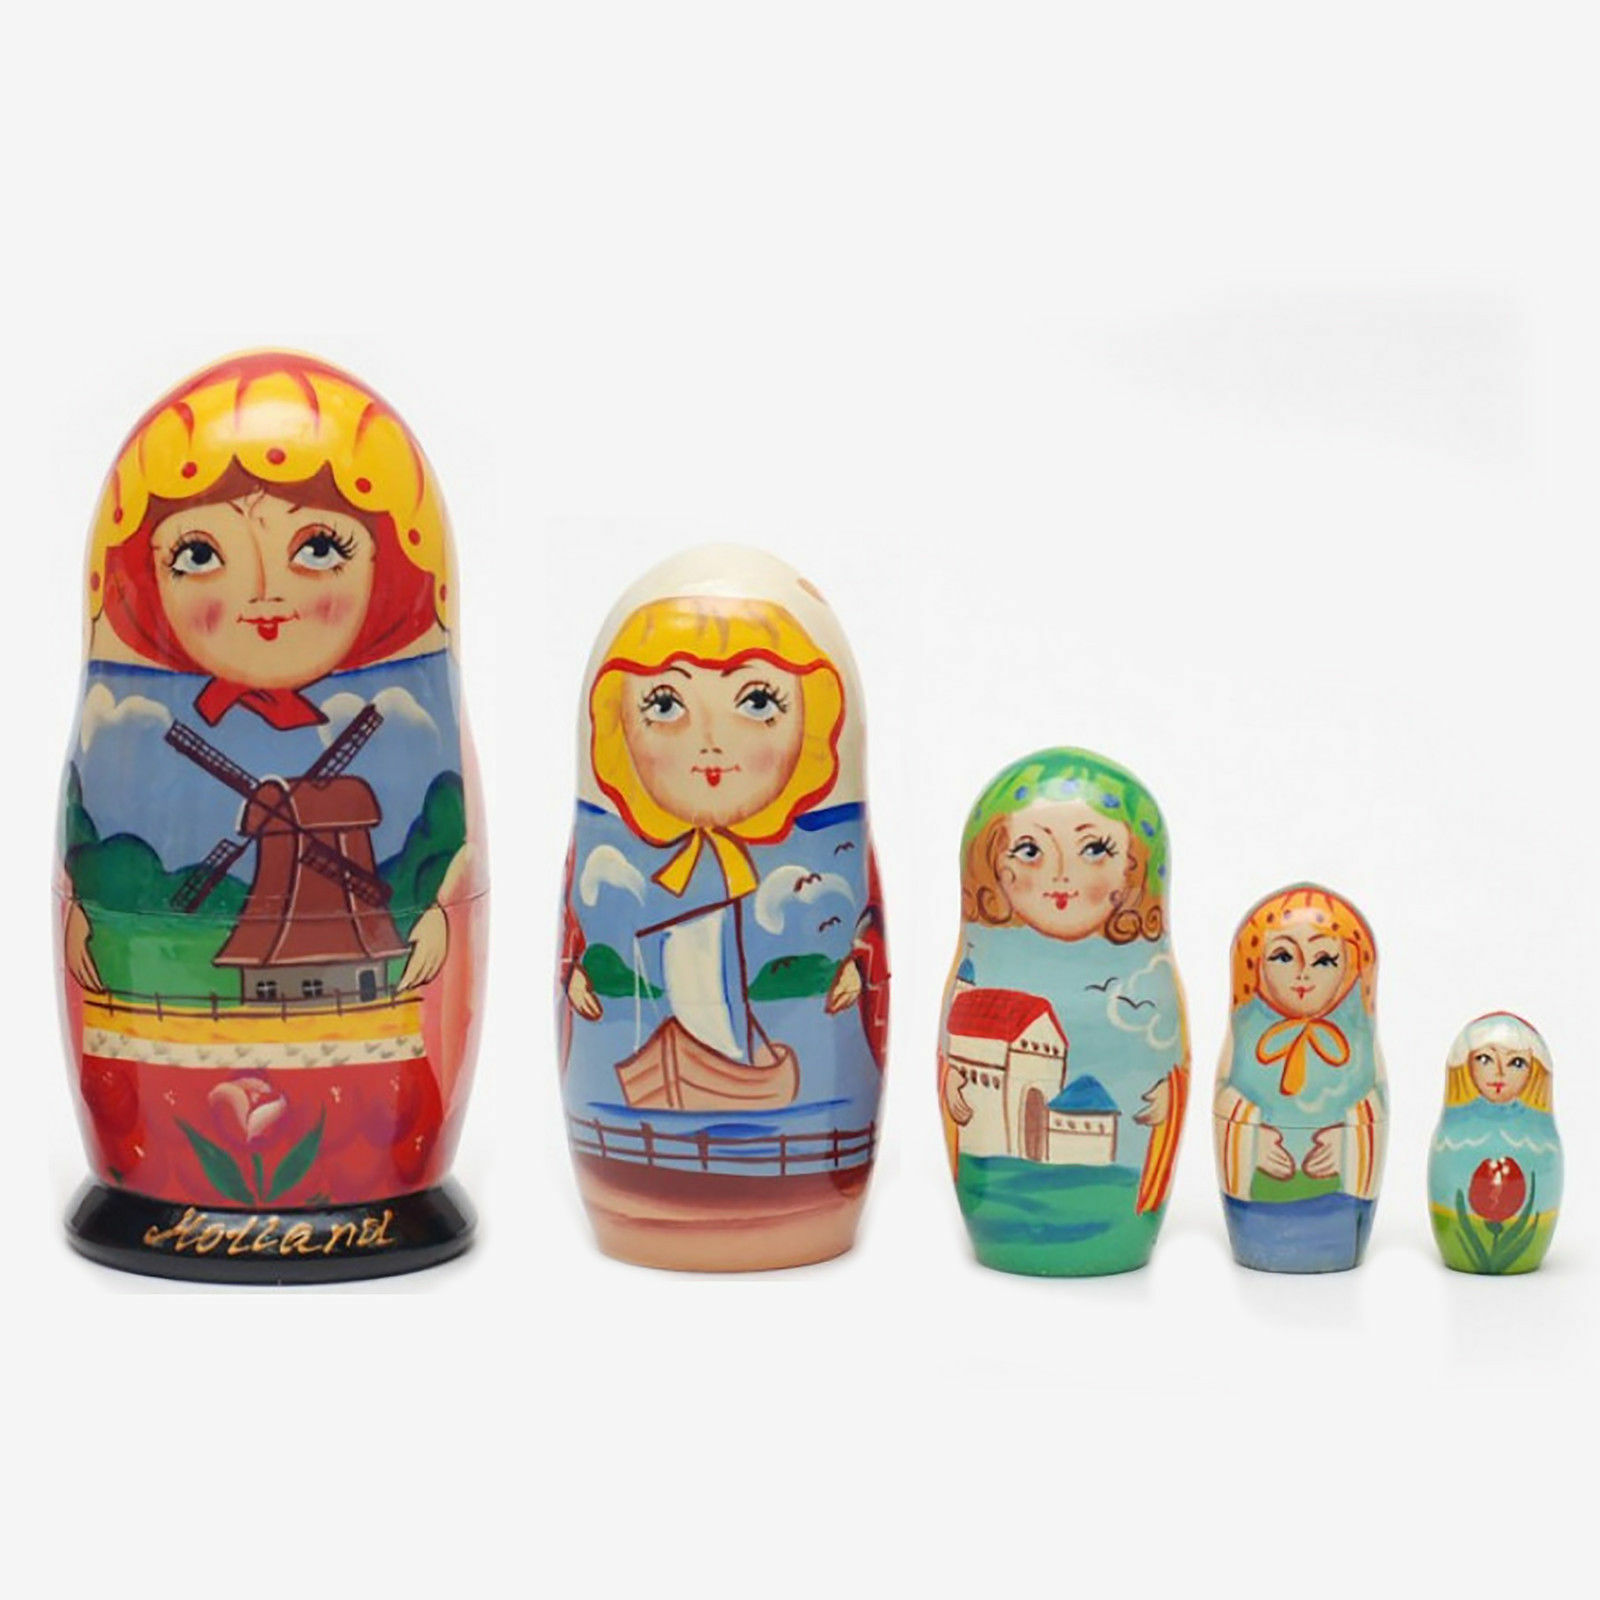 Offriamo vari marchi famosi Nesting Nesting Nesting bambolas Holle matryoshka He painted Signed russian baautobushka bambola  presa di fabbrica